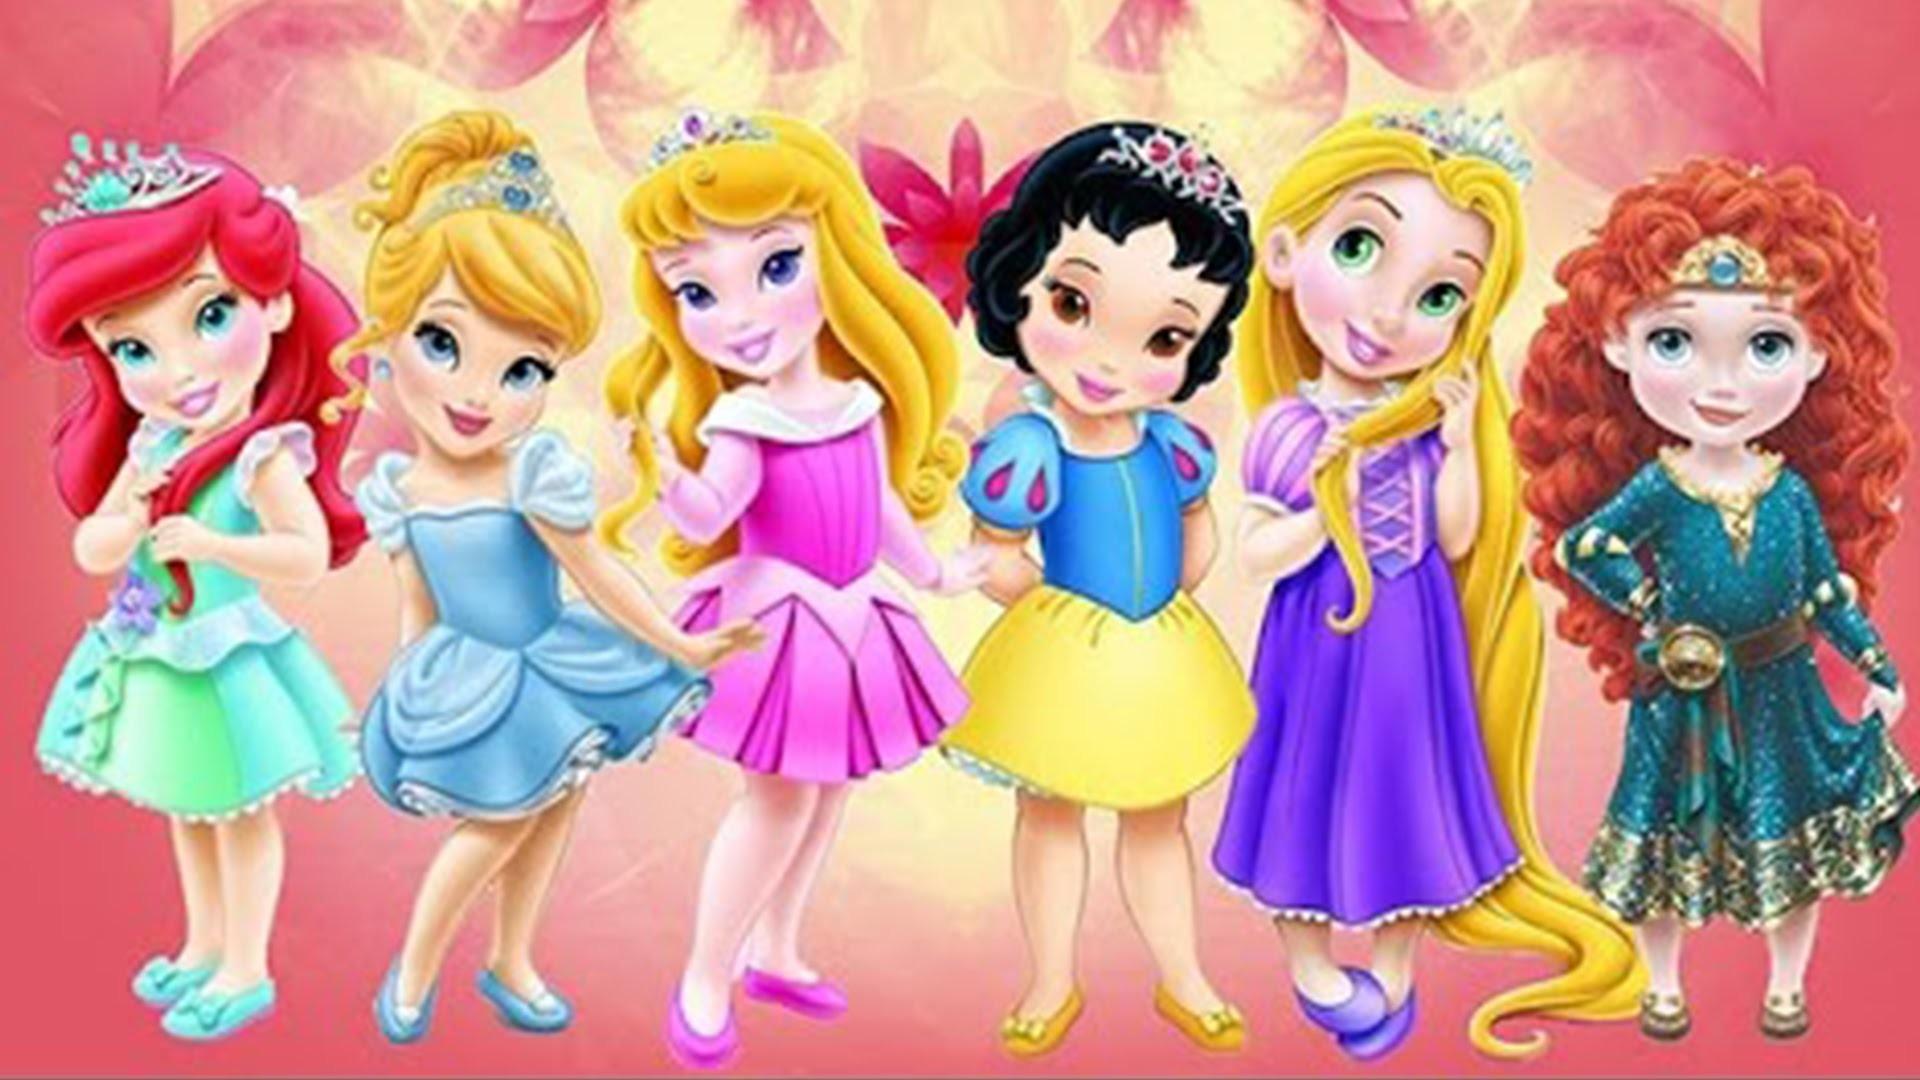 1920x1200 Tags Disney Princess Aurora